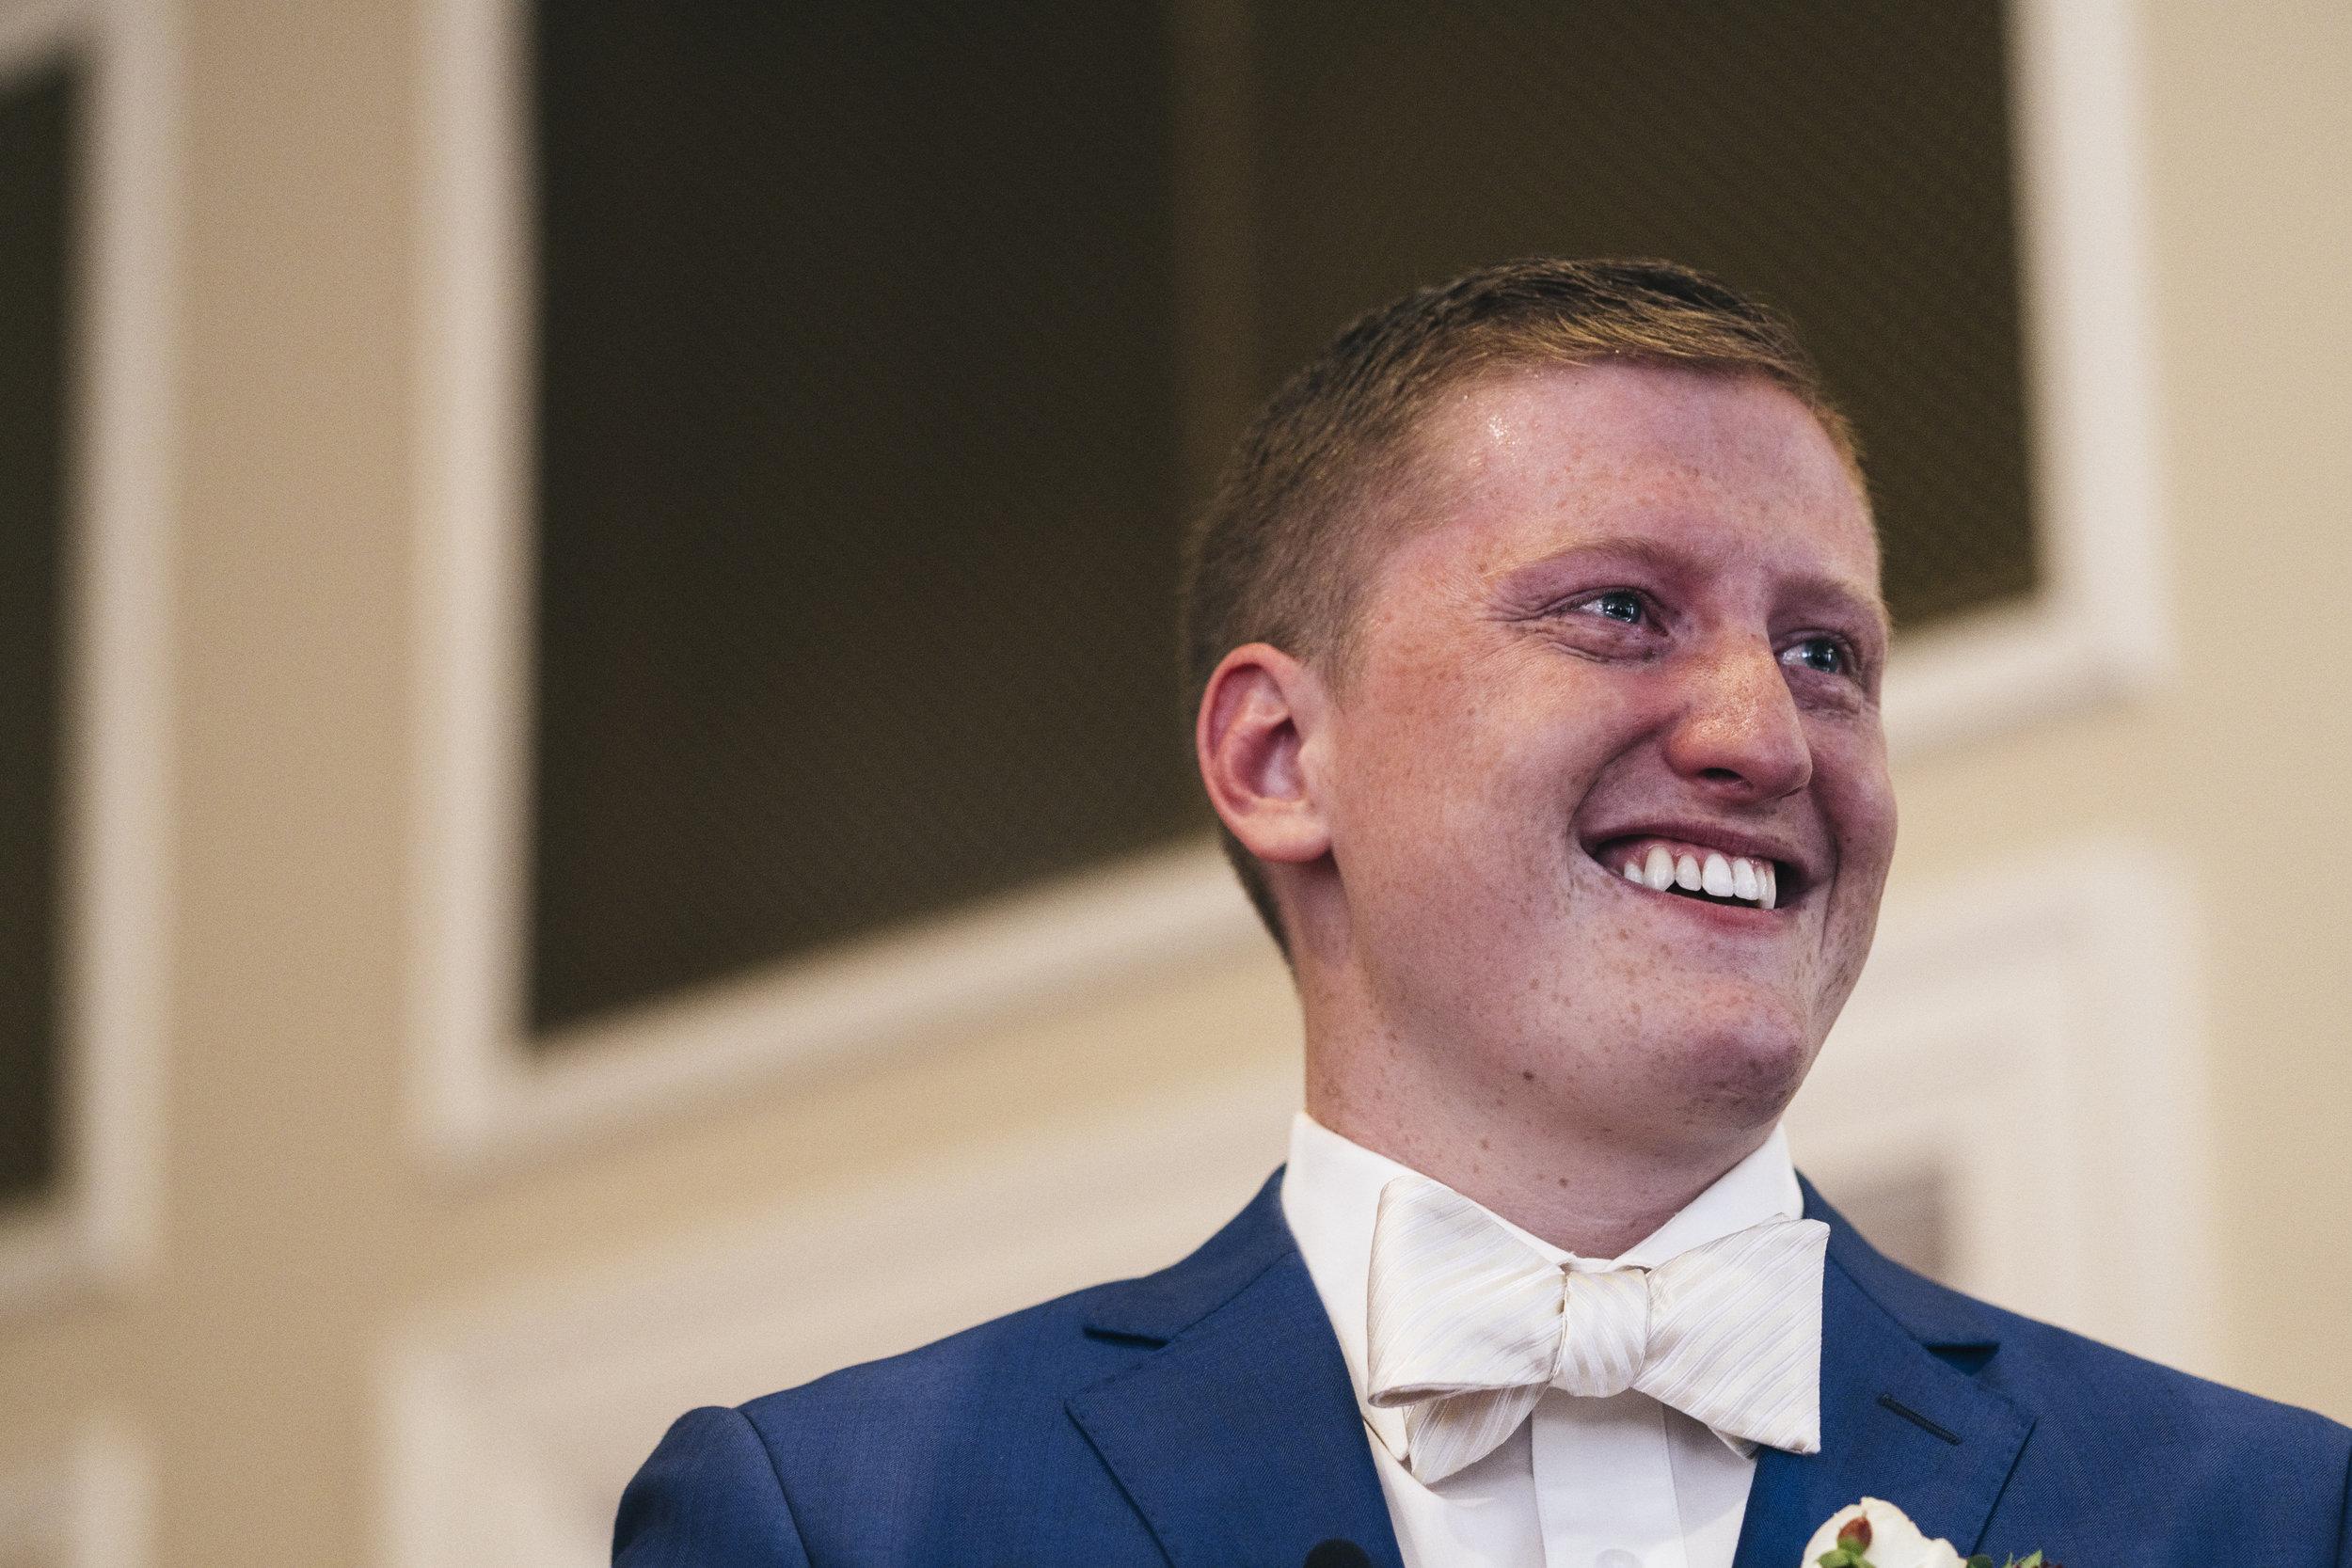 Groom_at_Prout_Chapel_Wedding.jpg